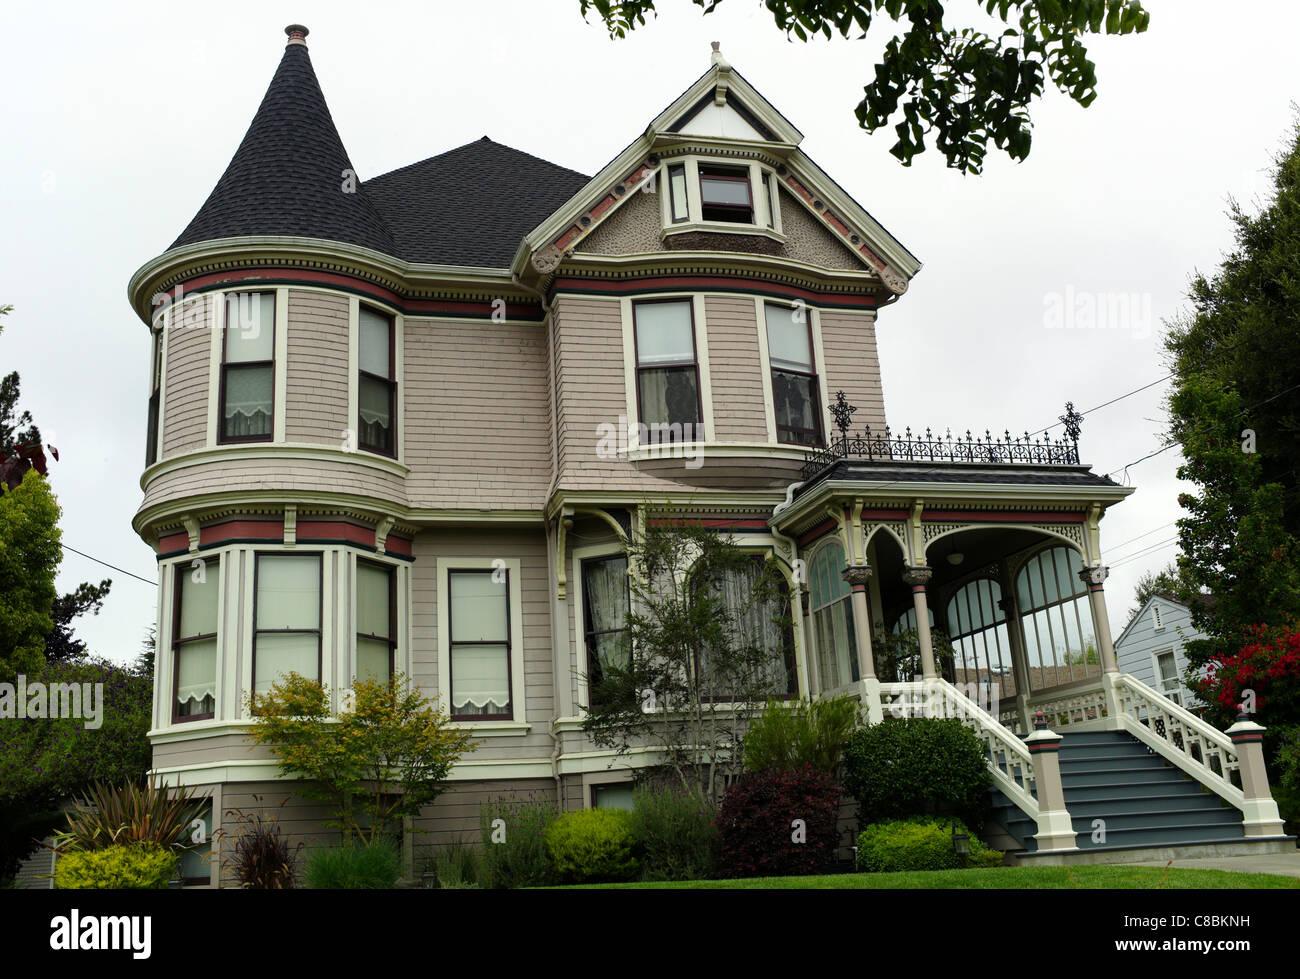 Edwardian Home Interiors Victorian Home Architecture 19th Century Queen Victoria